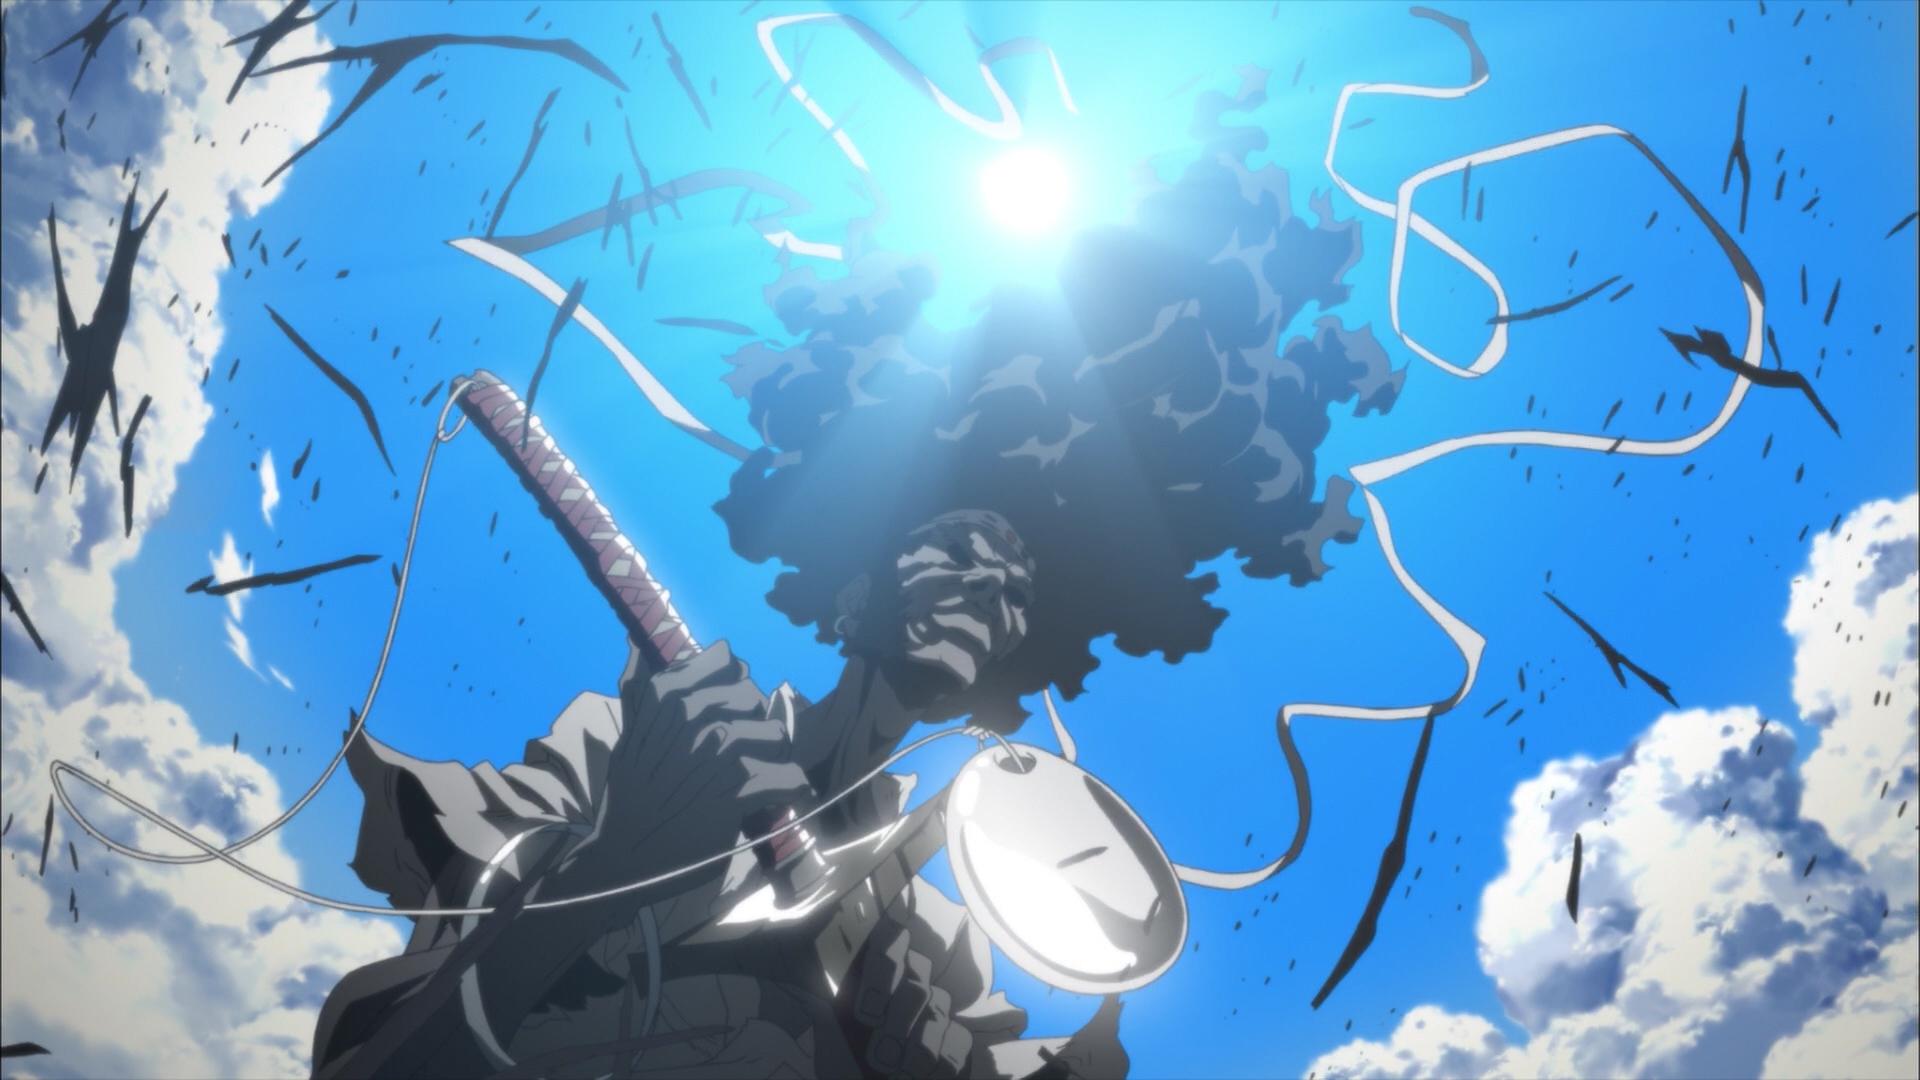 Afro Samurai Resurrection wallpaper 195308 1920x1080